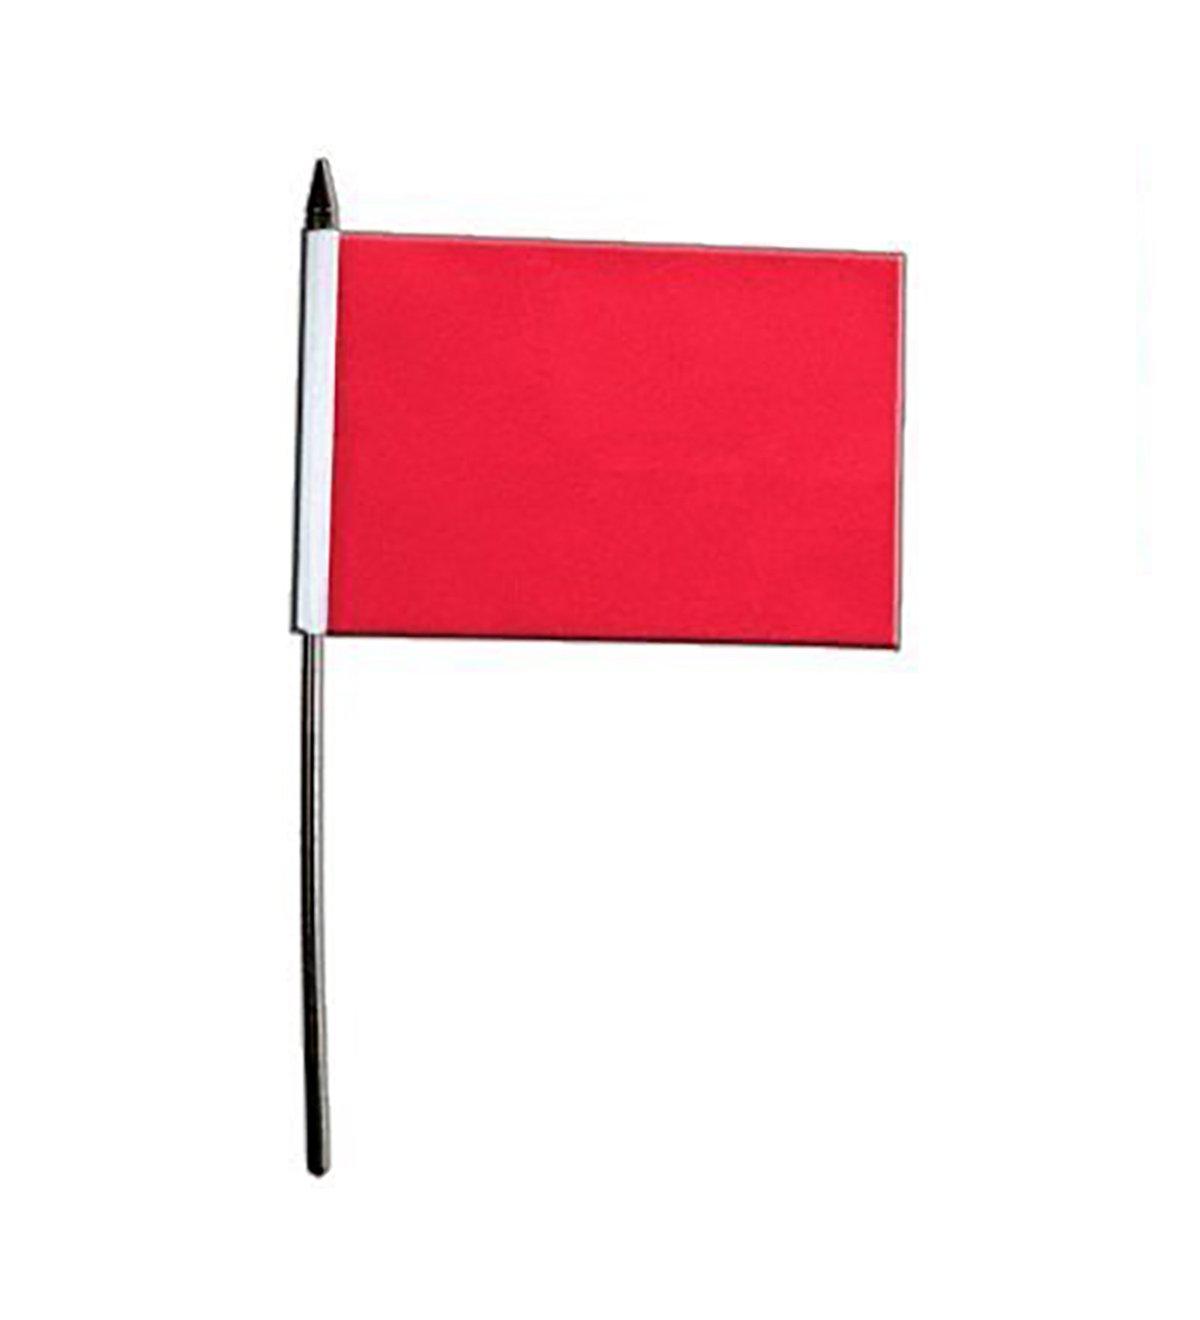 "PLAIN RED Handwaving Flag 9/"" x 6/"" Polyester Flag 12/"" Wooden Pole"